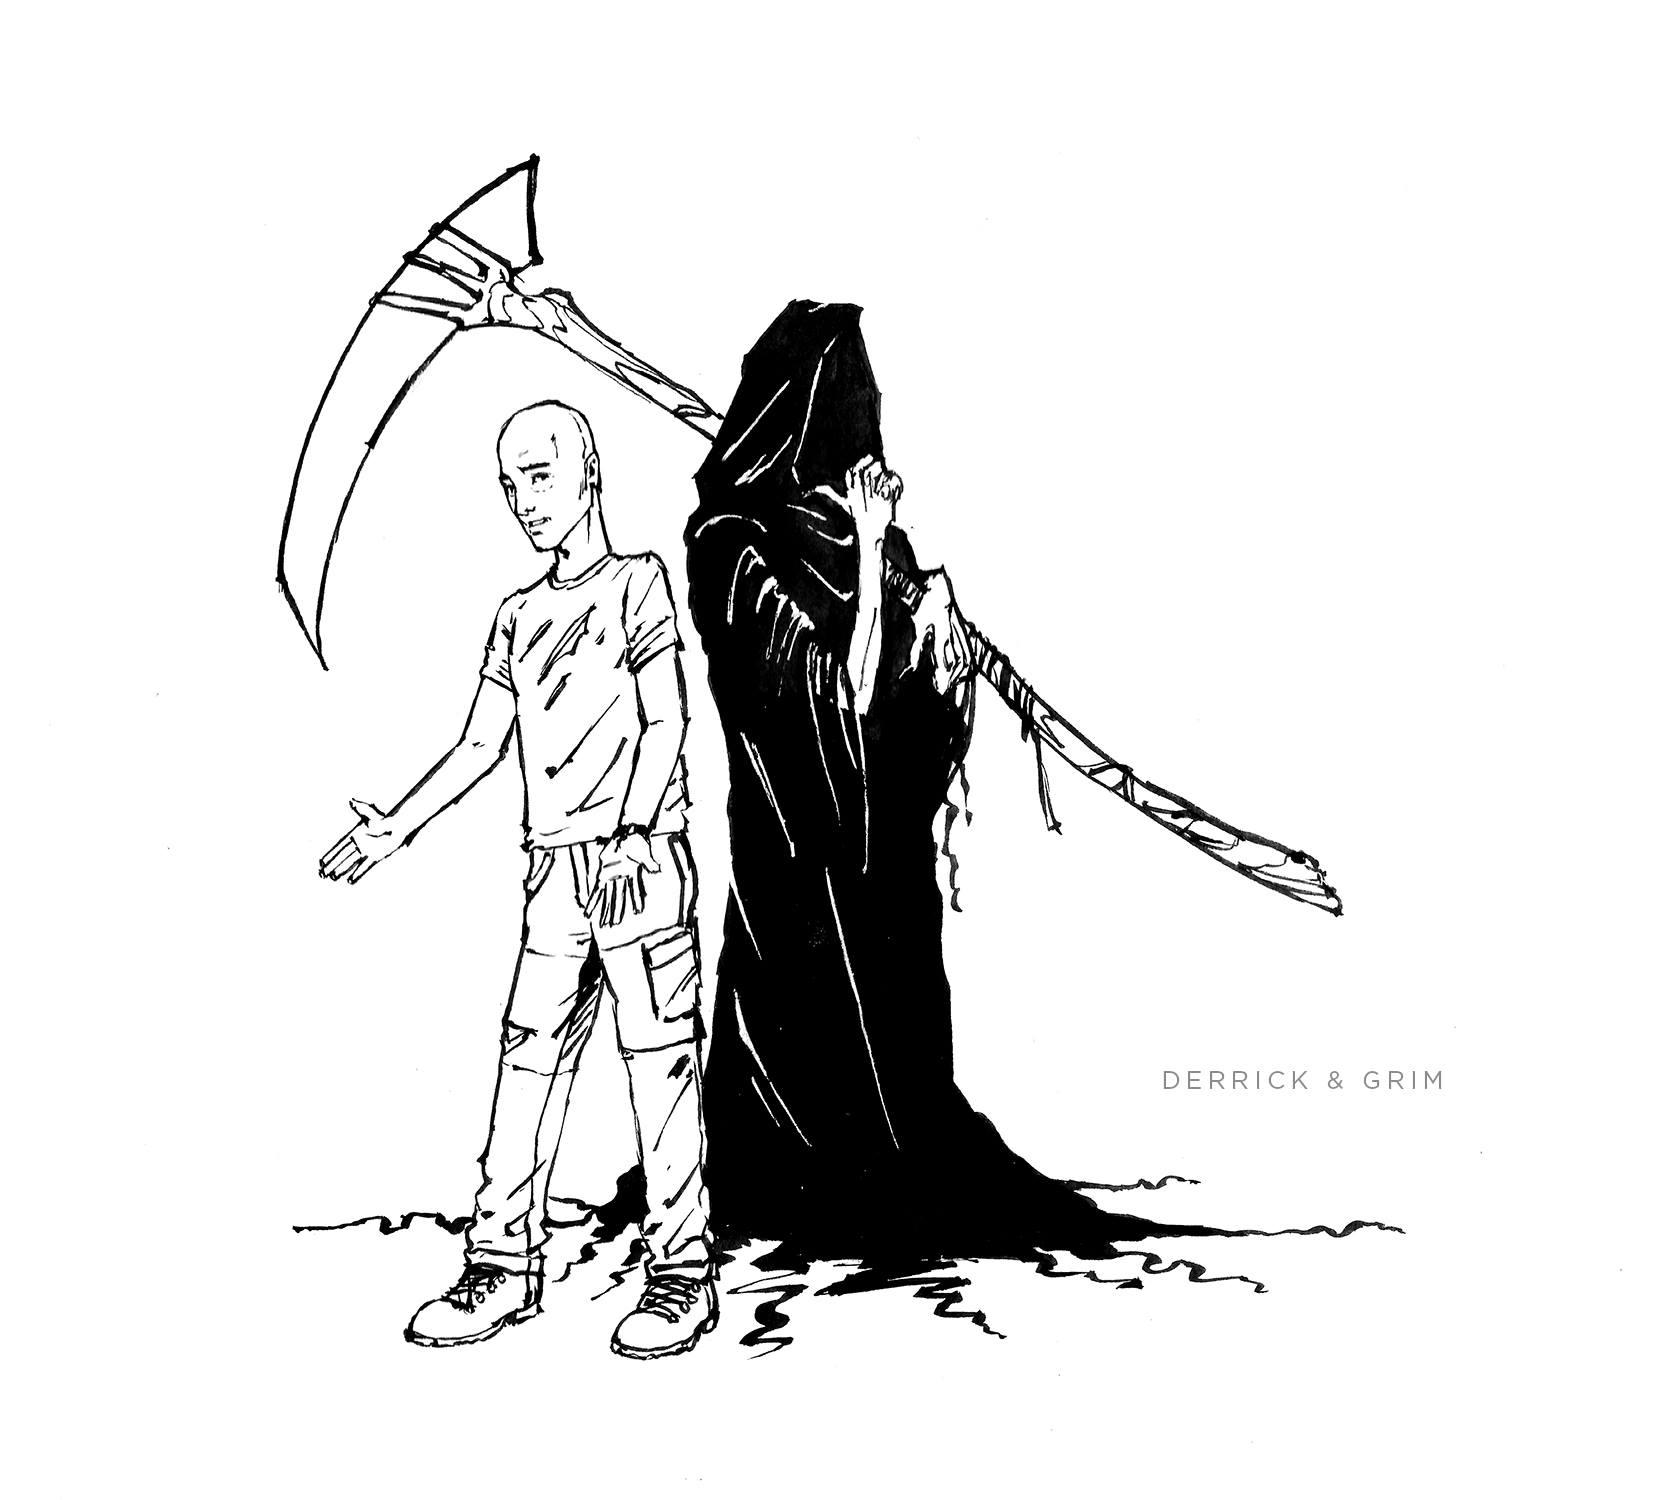 Derrick and Grim Sketch.jpg